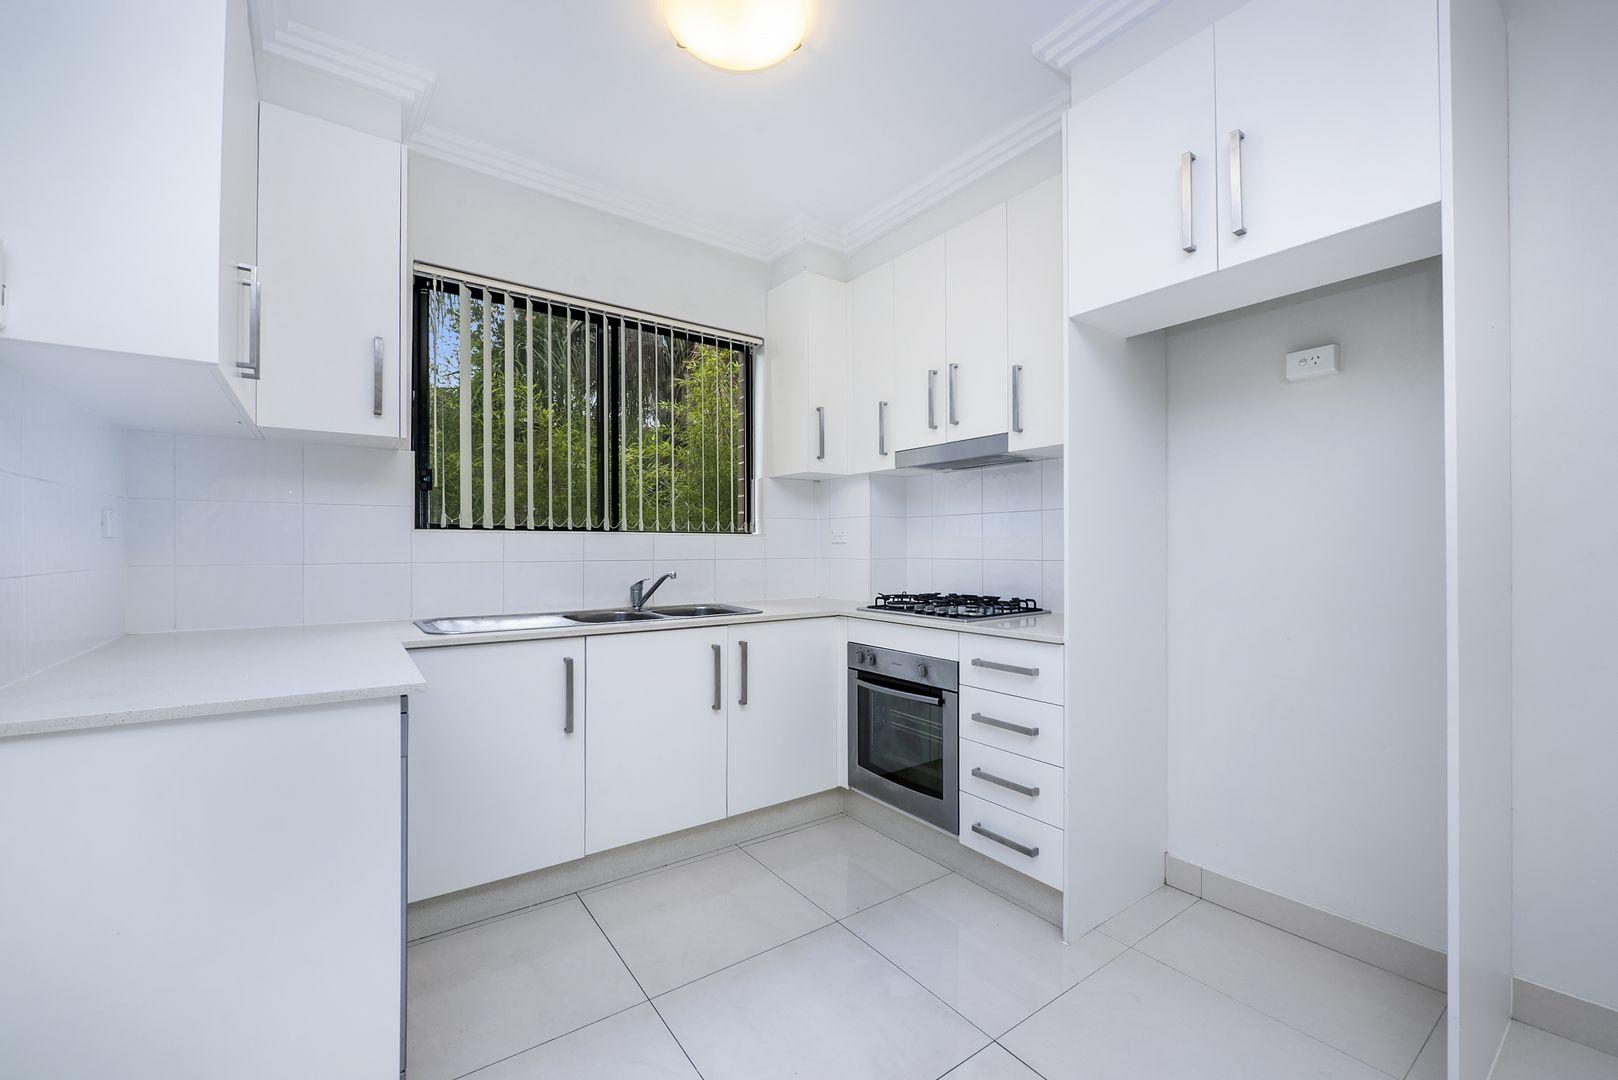 10/8-10 Ewart Street, Marrickville NSW 2204, Image 2